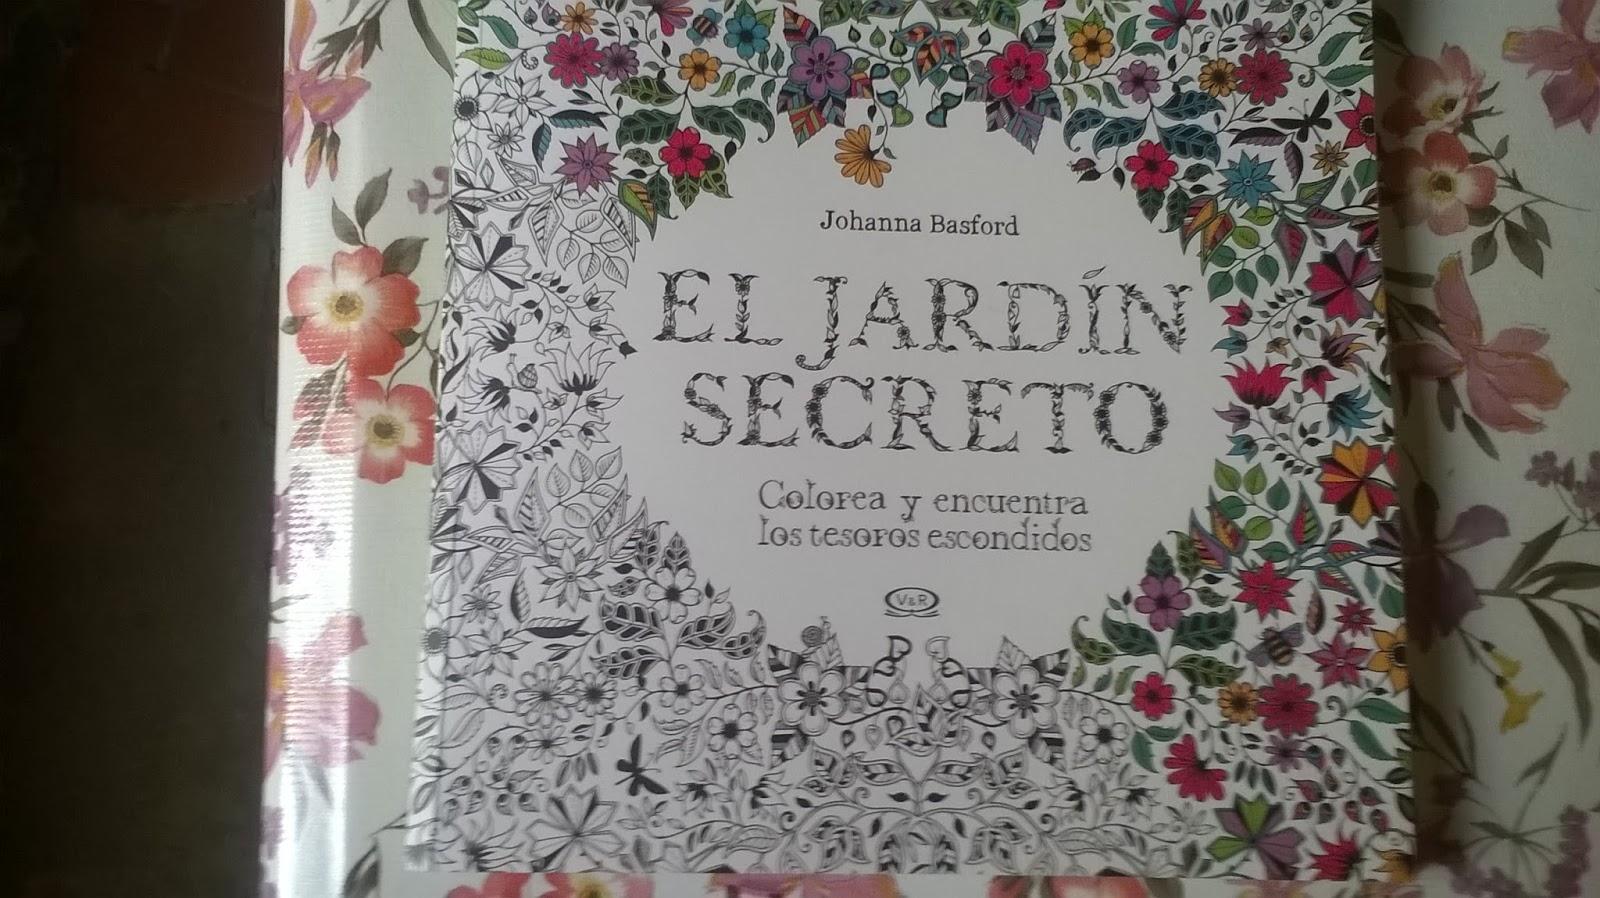 Sol De Echesortu Resena El Jardin Secreto Johanna Basford